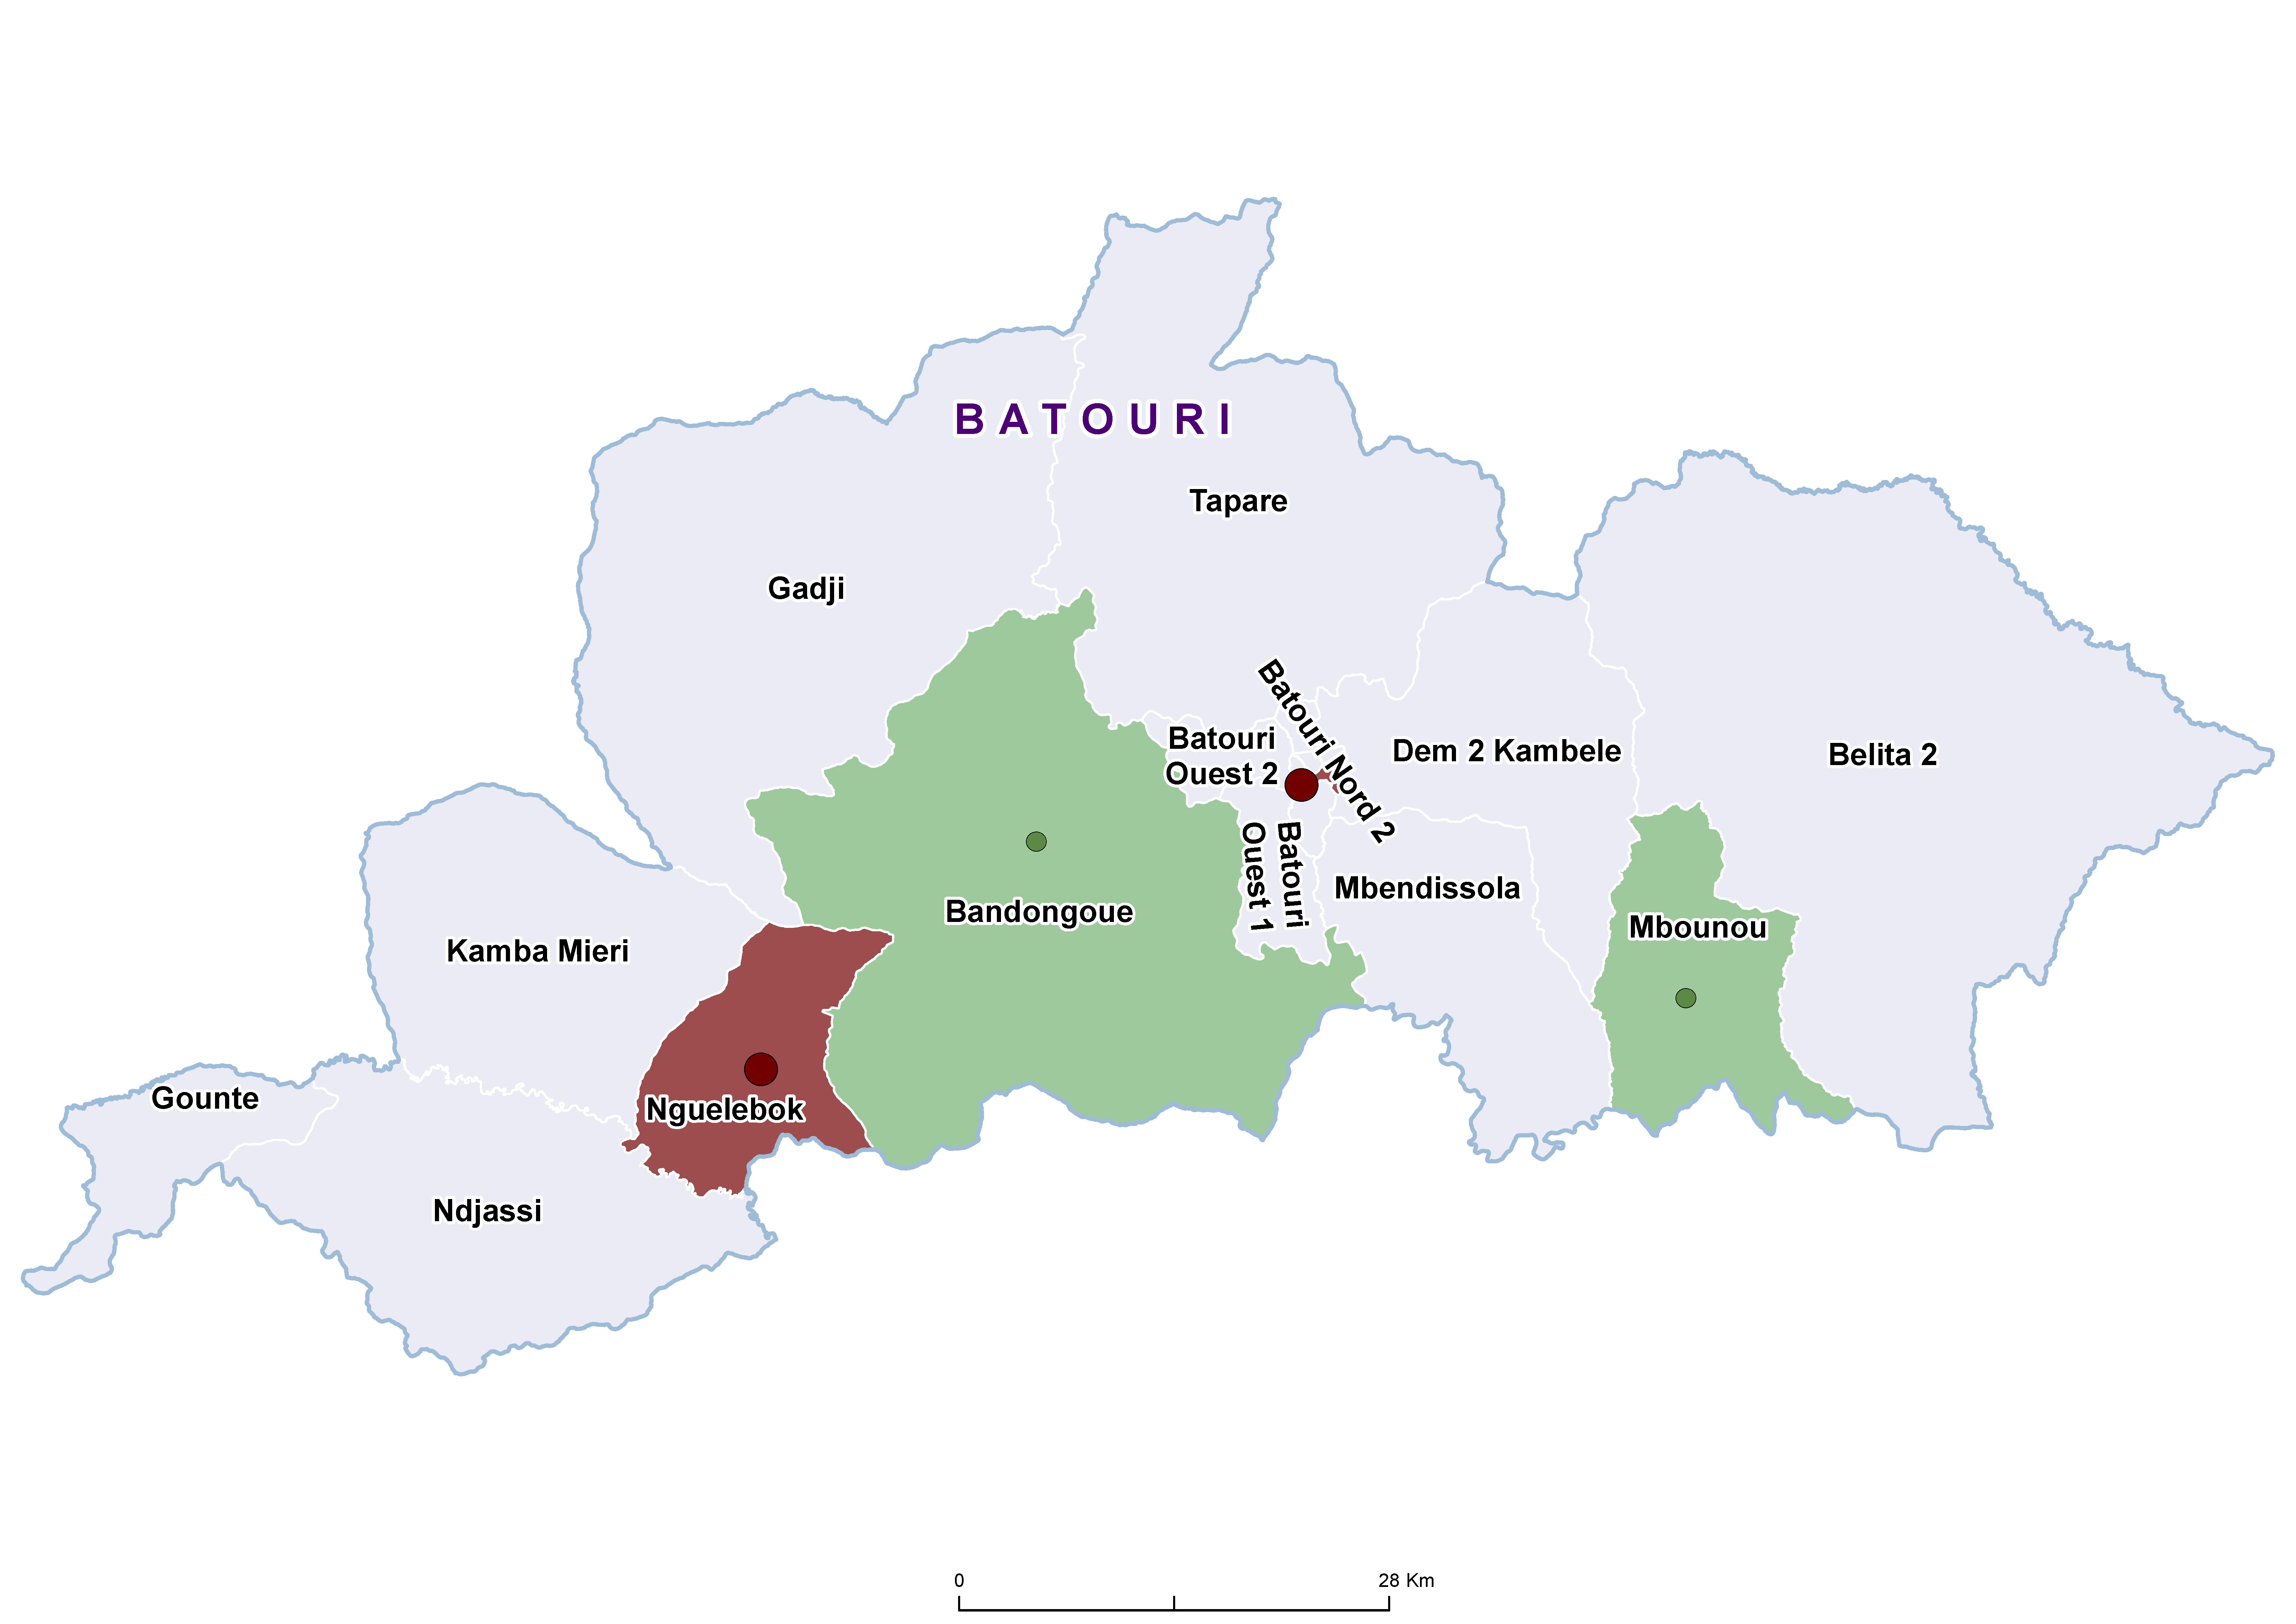 Batouri STH 19850001